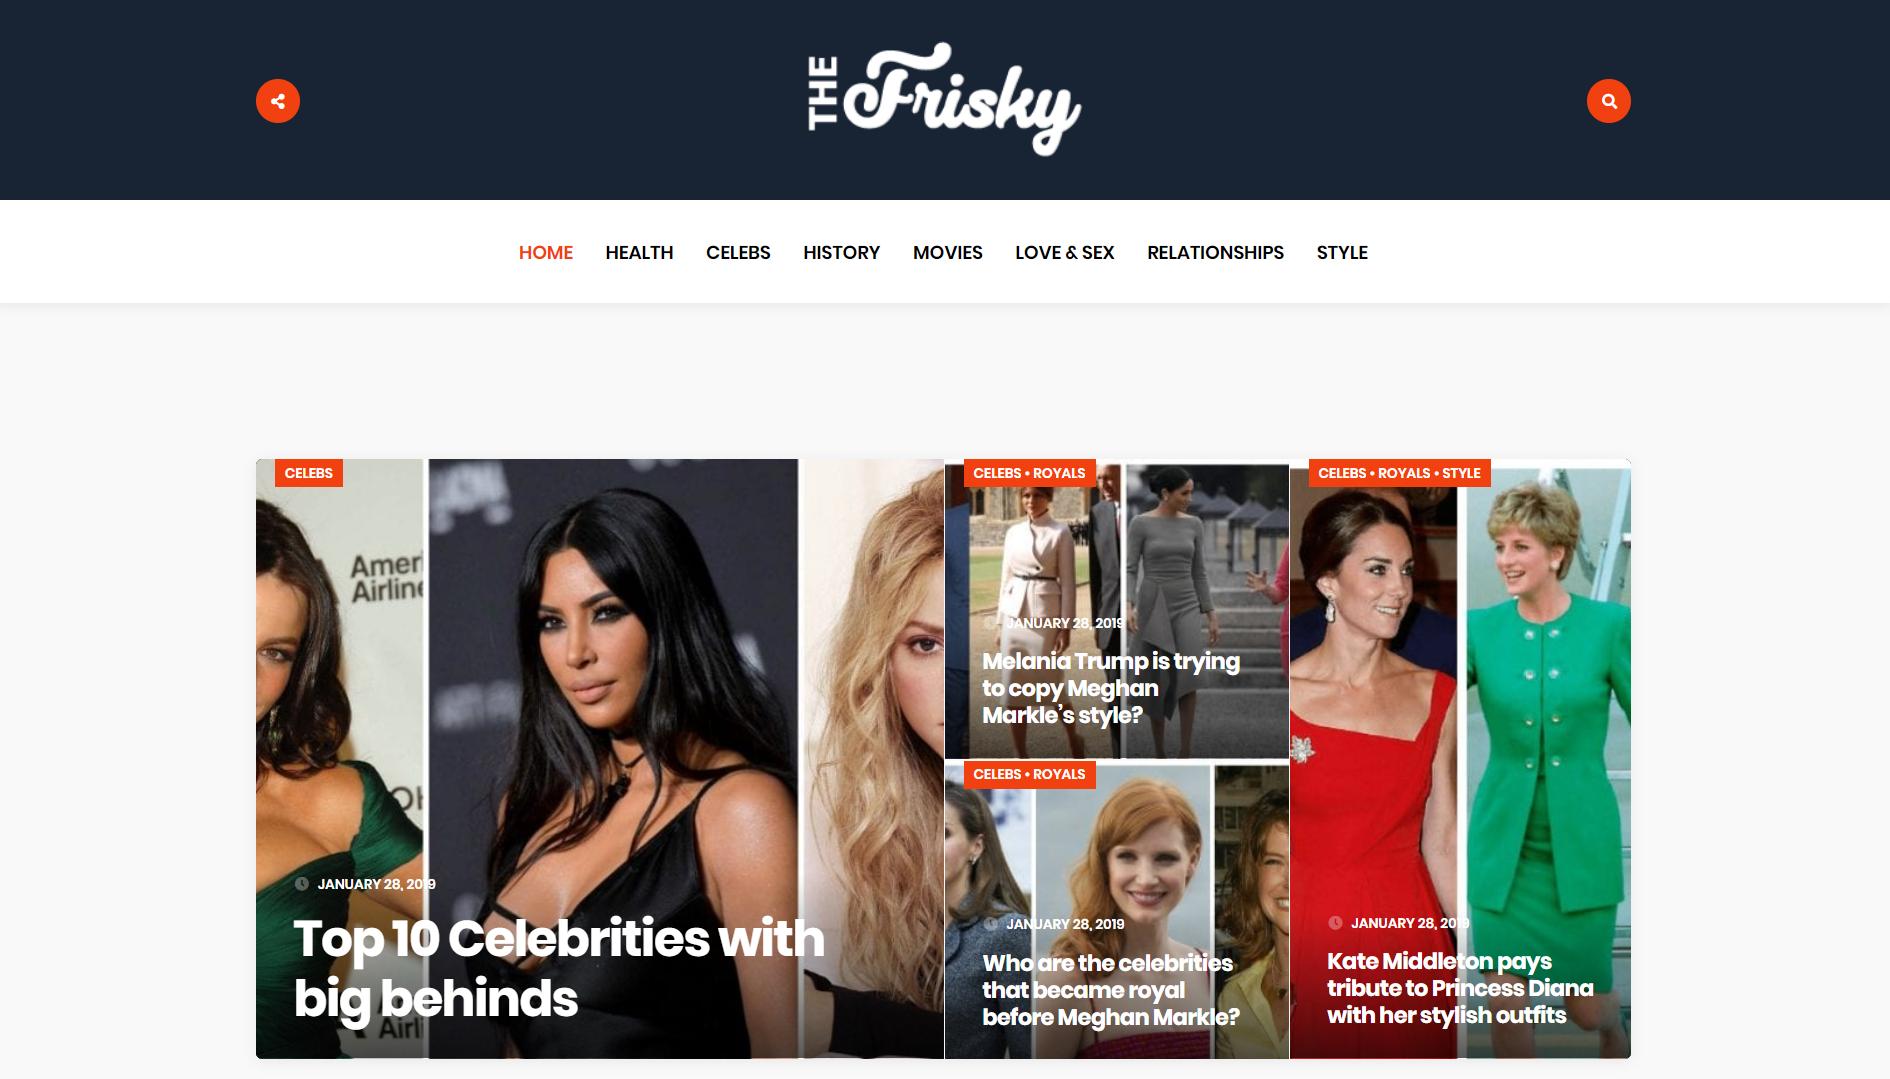 publish guest post on thefrisky. com